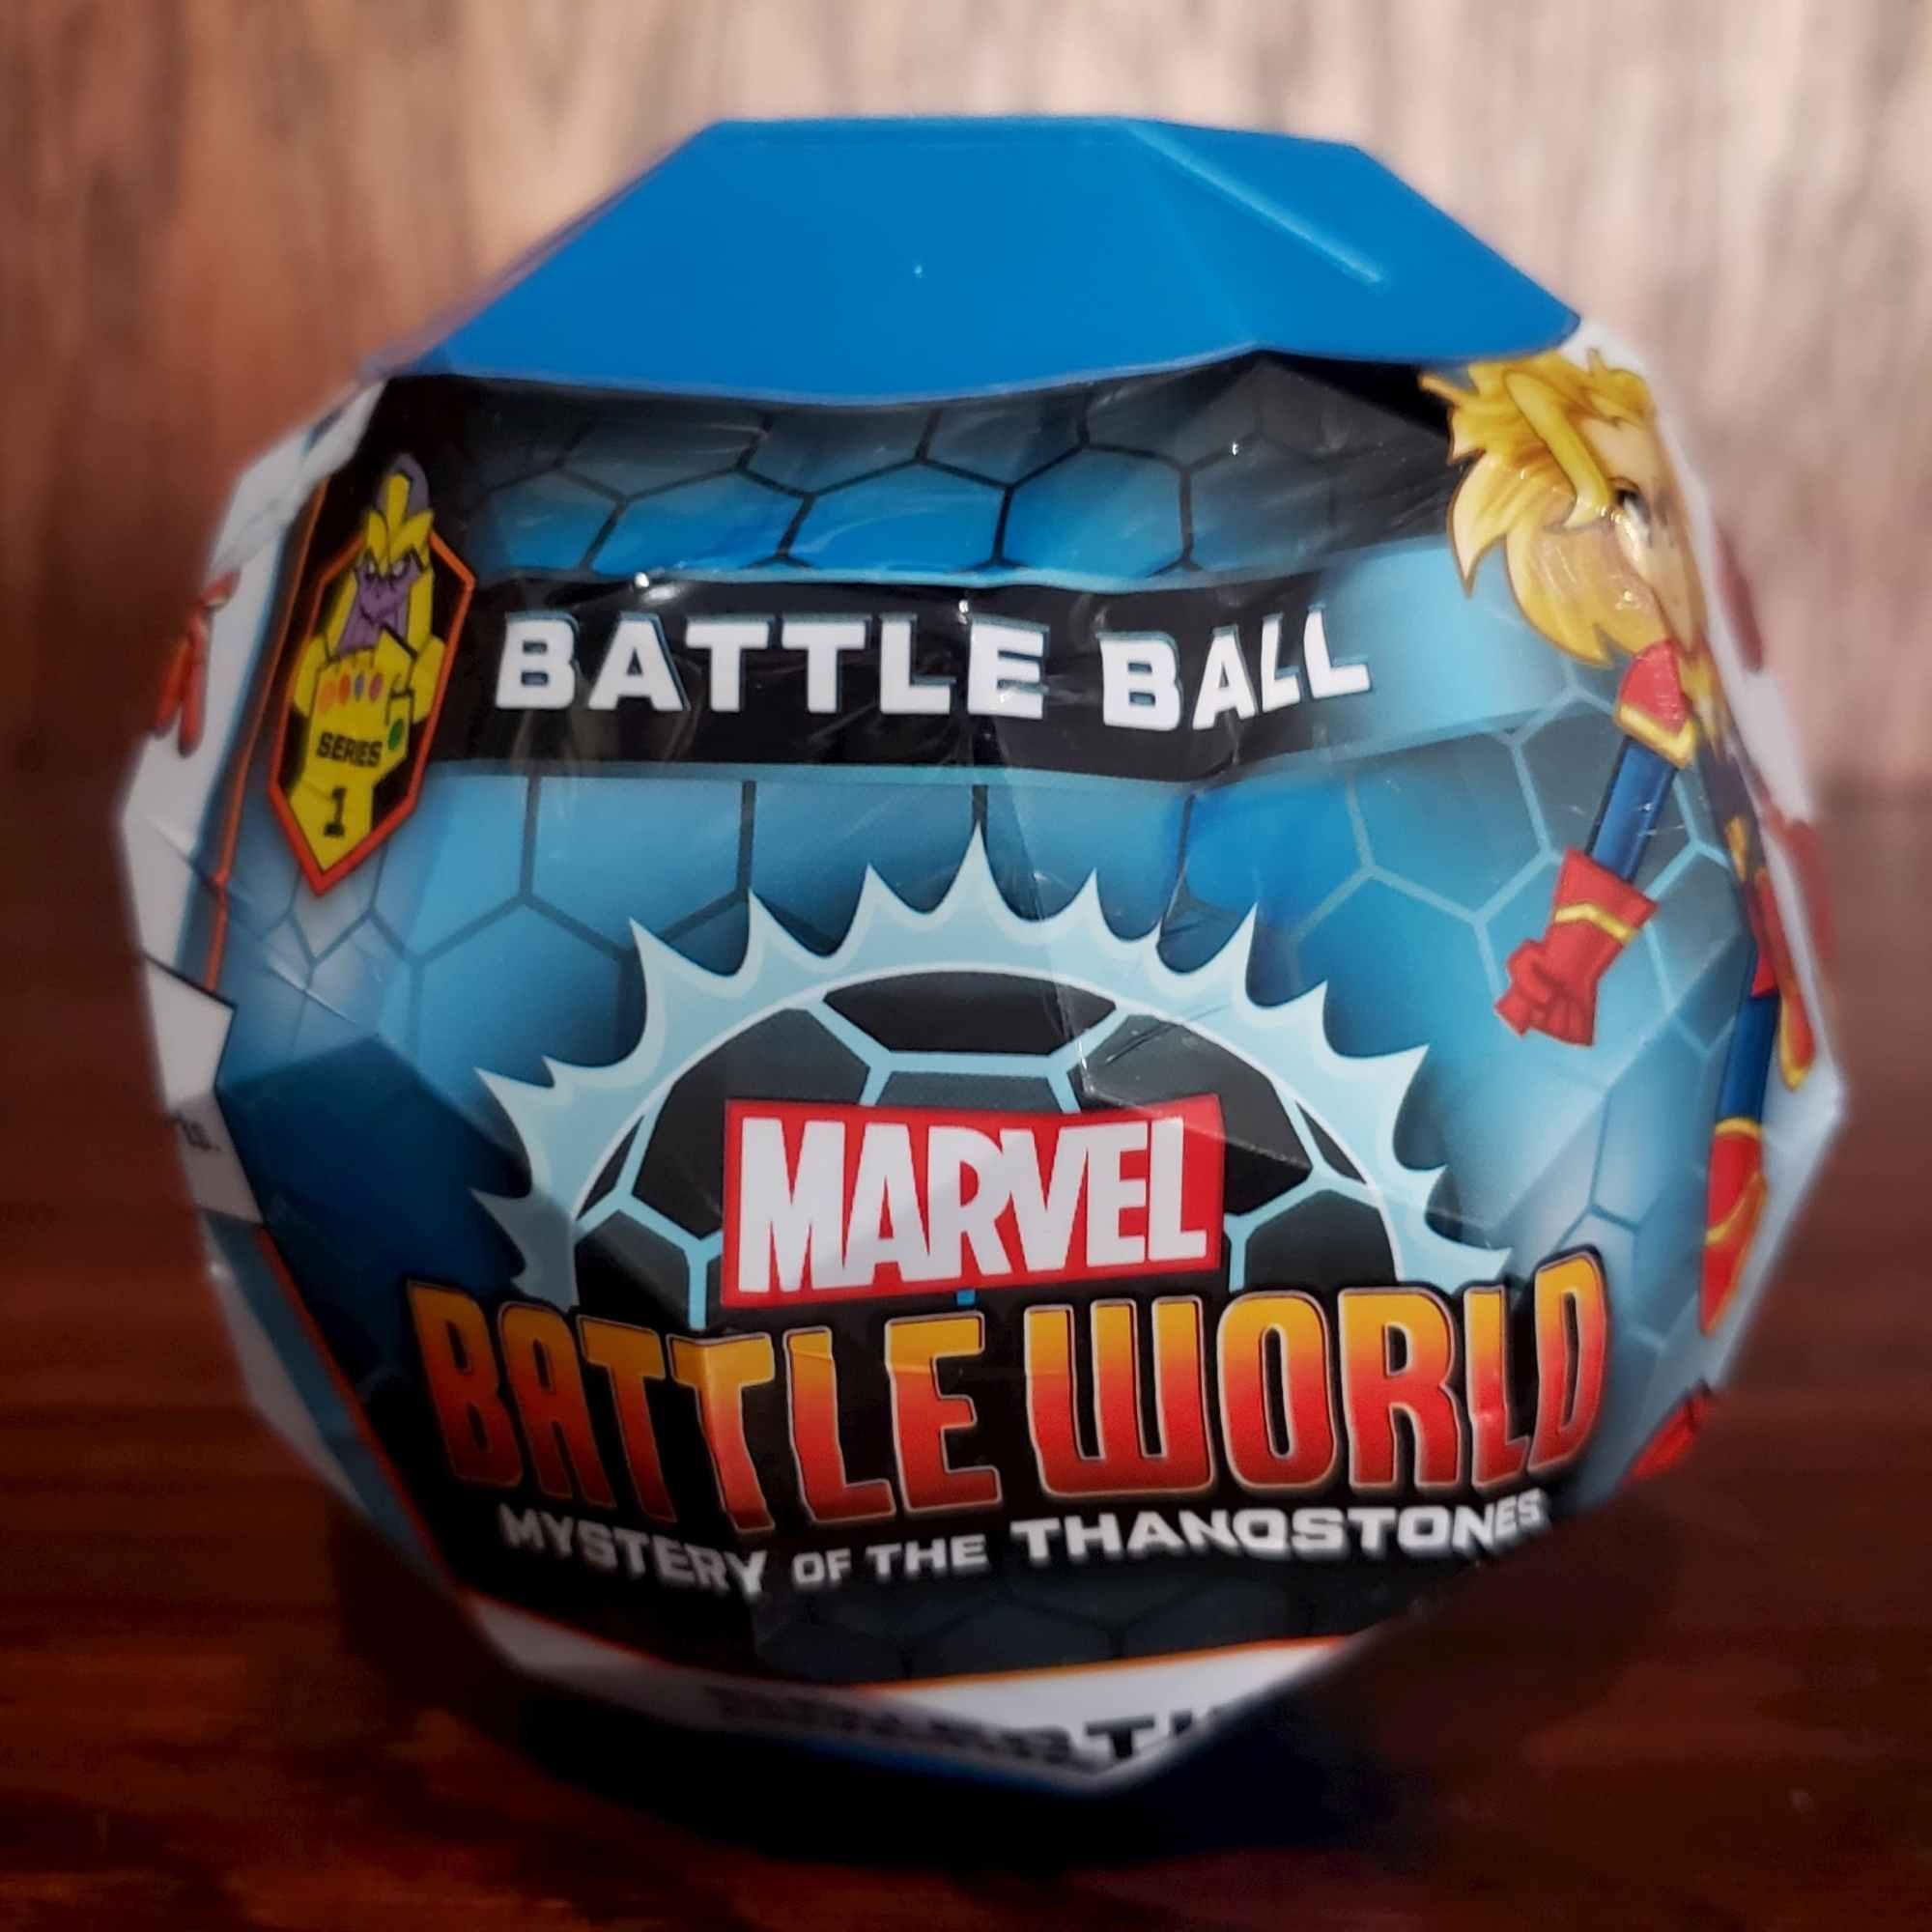 Marvel Battle World Stocking Stuffer Idea